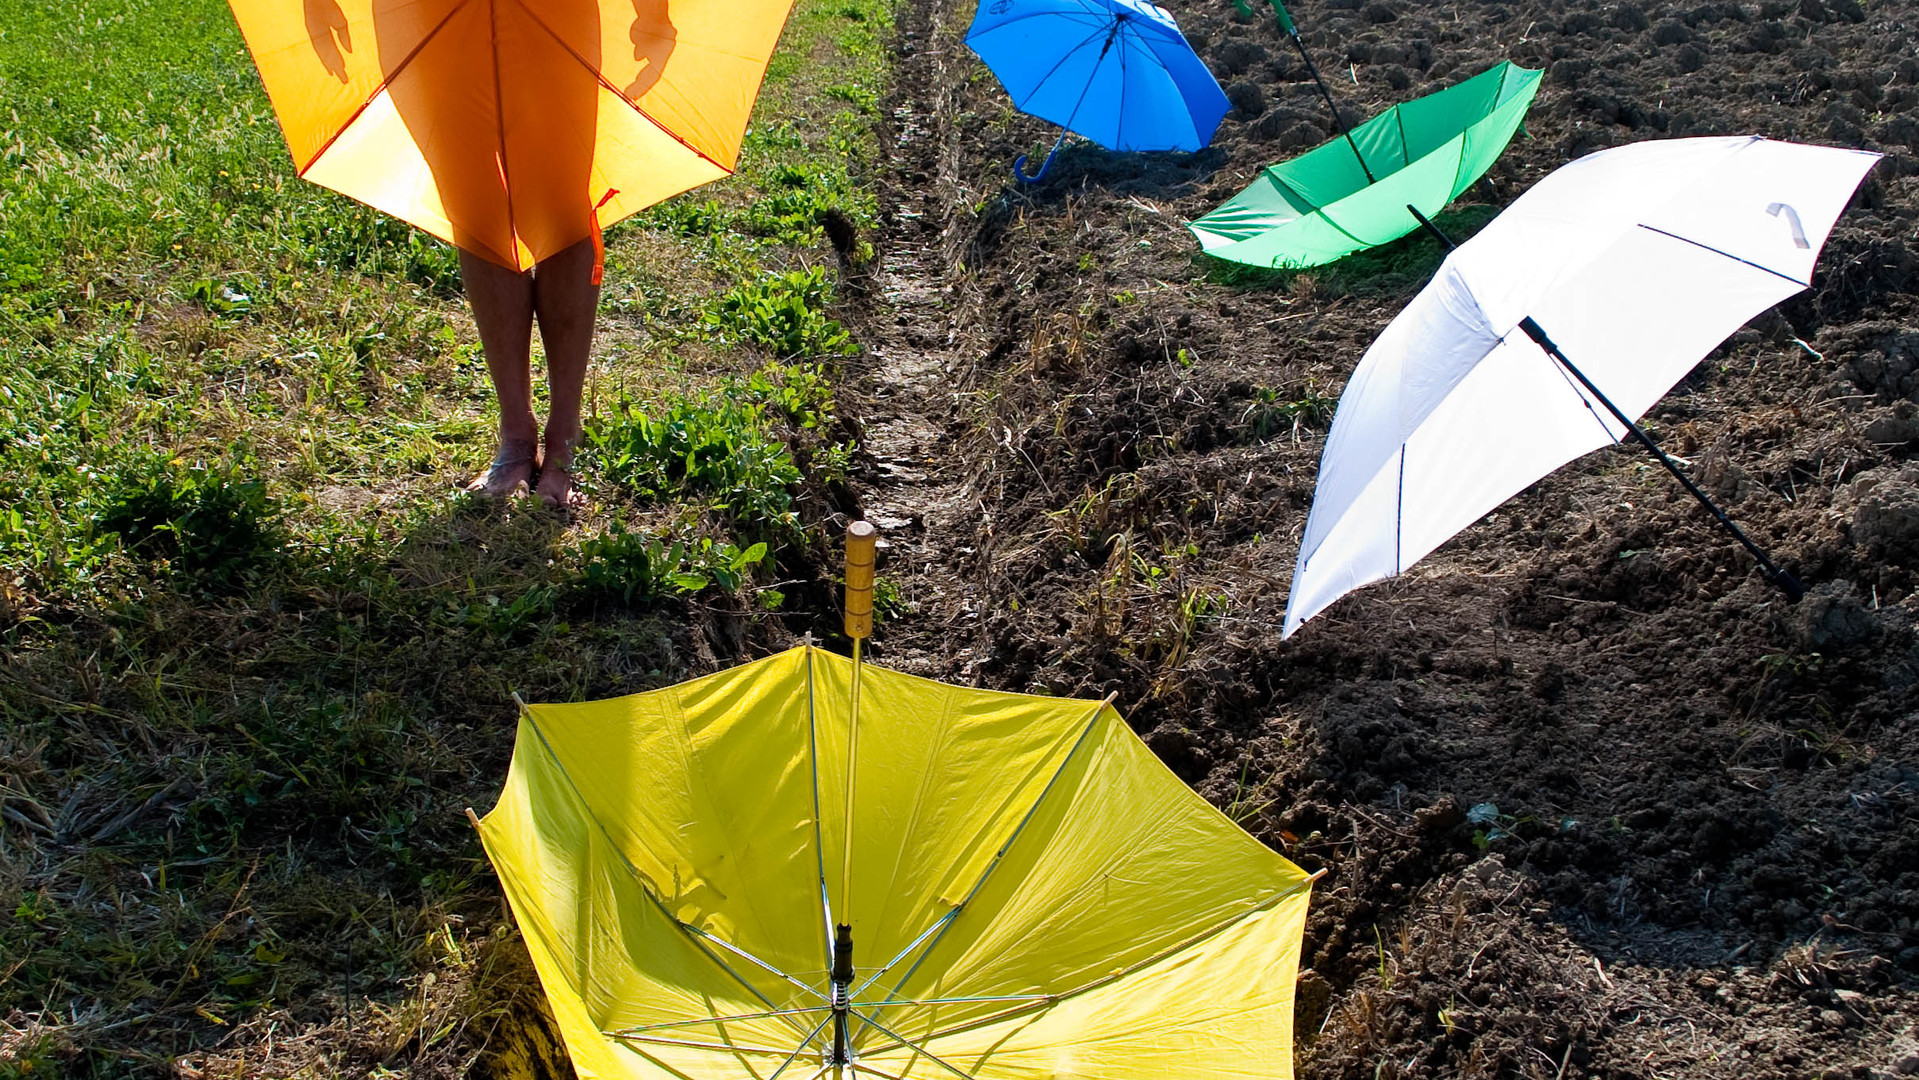 All umbrella.jpg